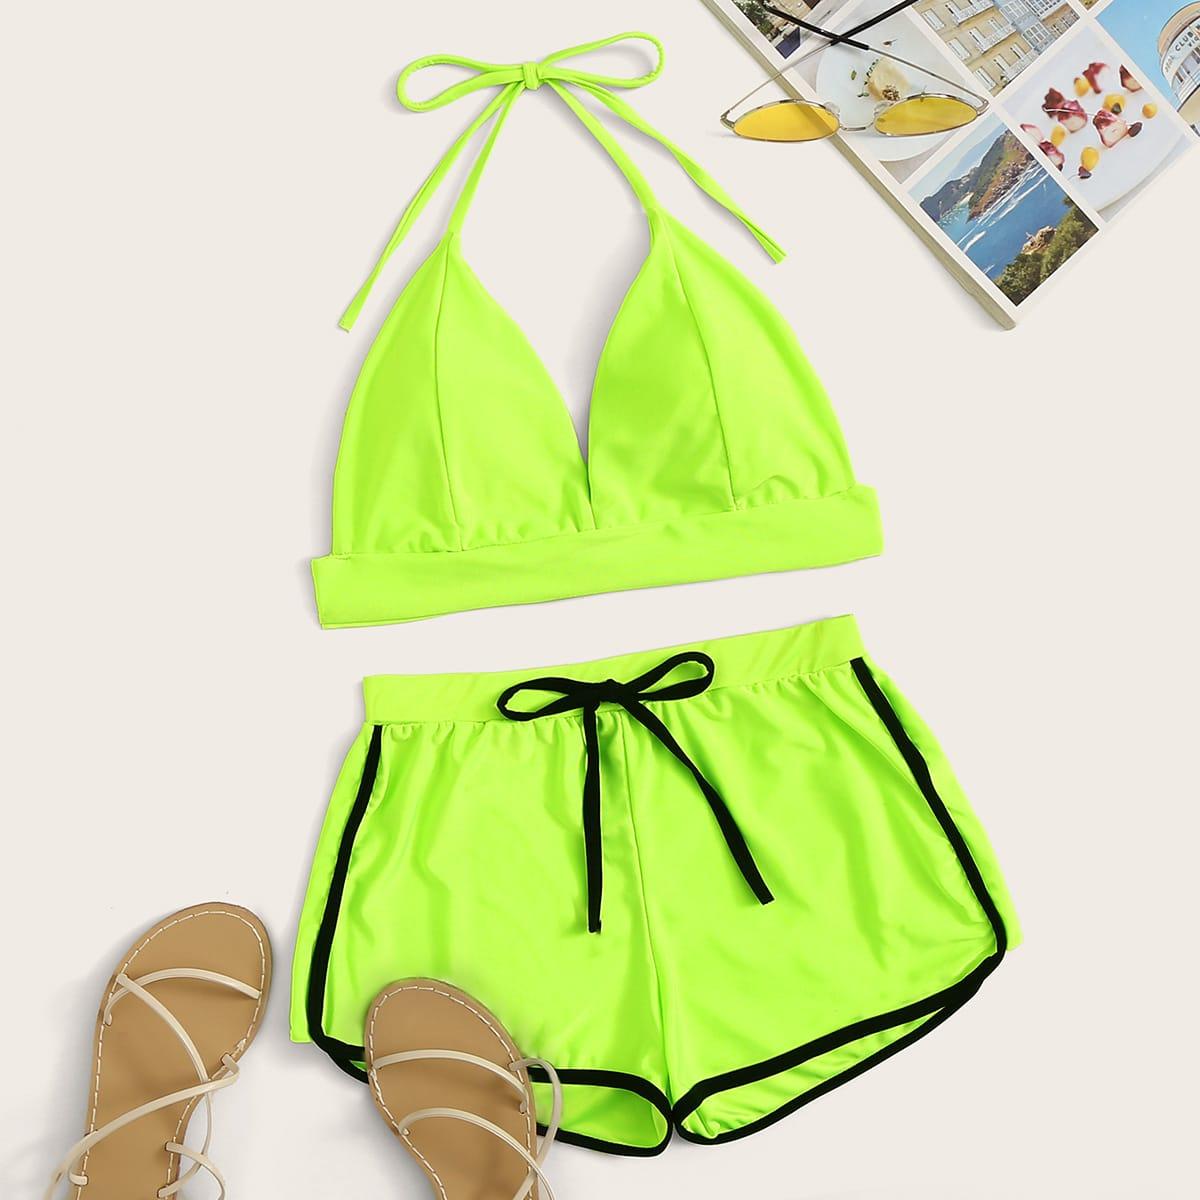 SHEIN coupon: Neon Lime Halter Shorts Bikini Swimsuit